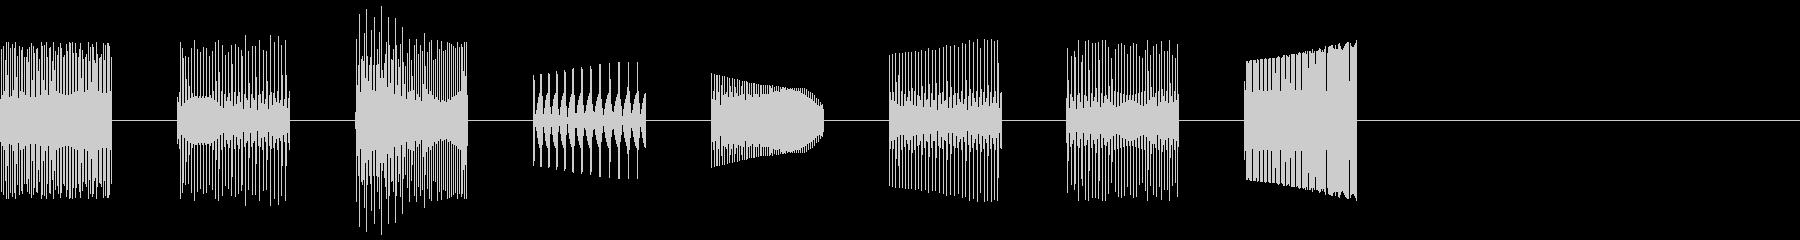 KANTピコ自主規制音3shortの未再生の波形